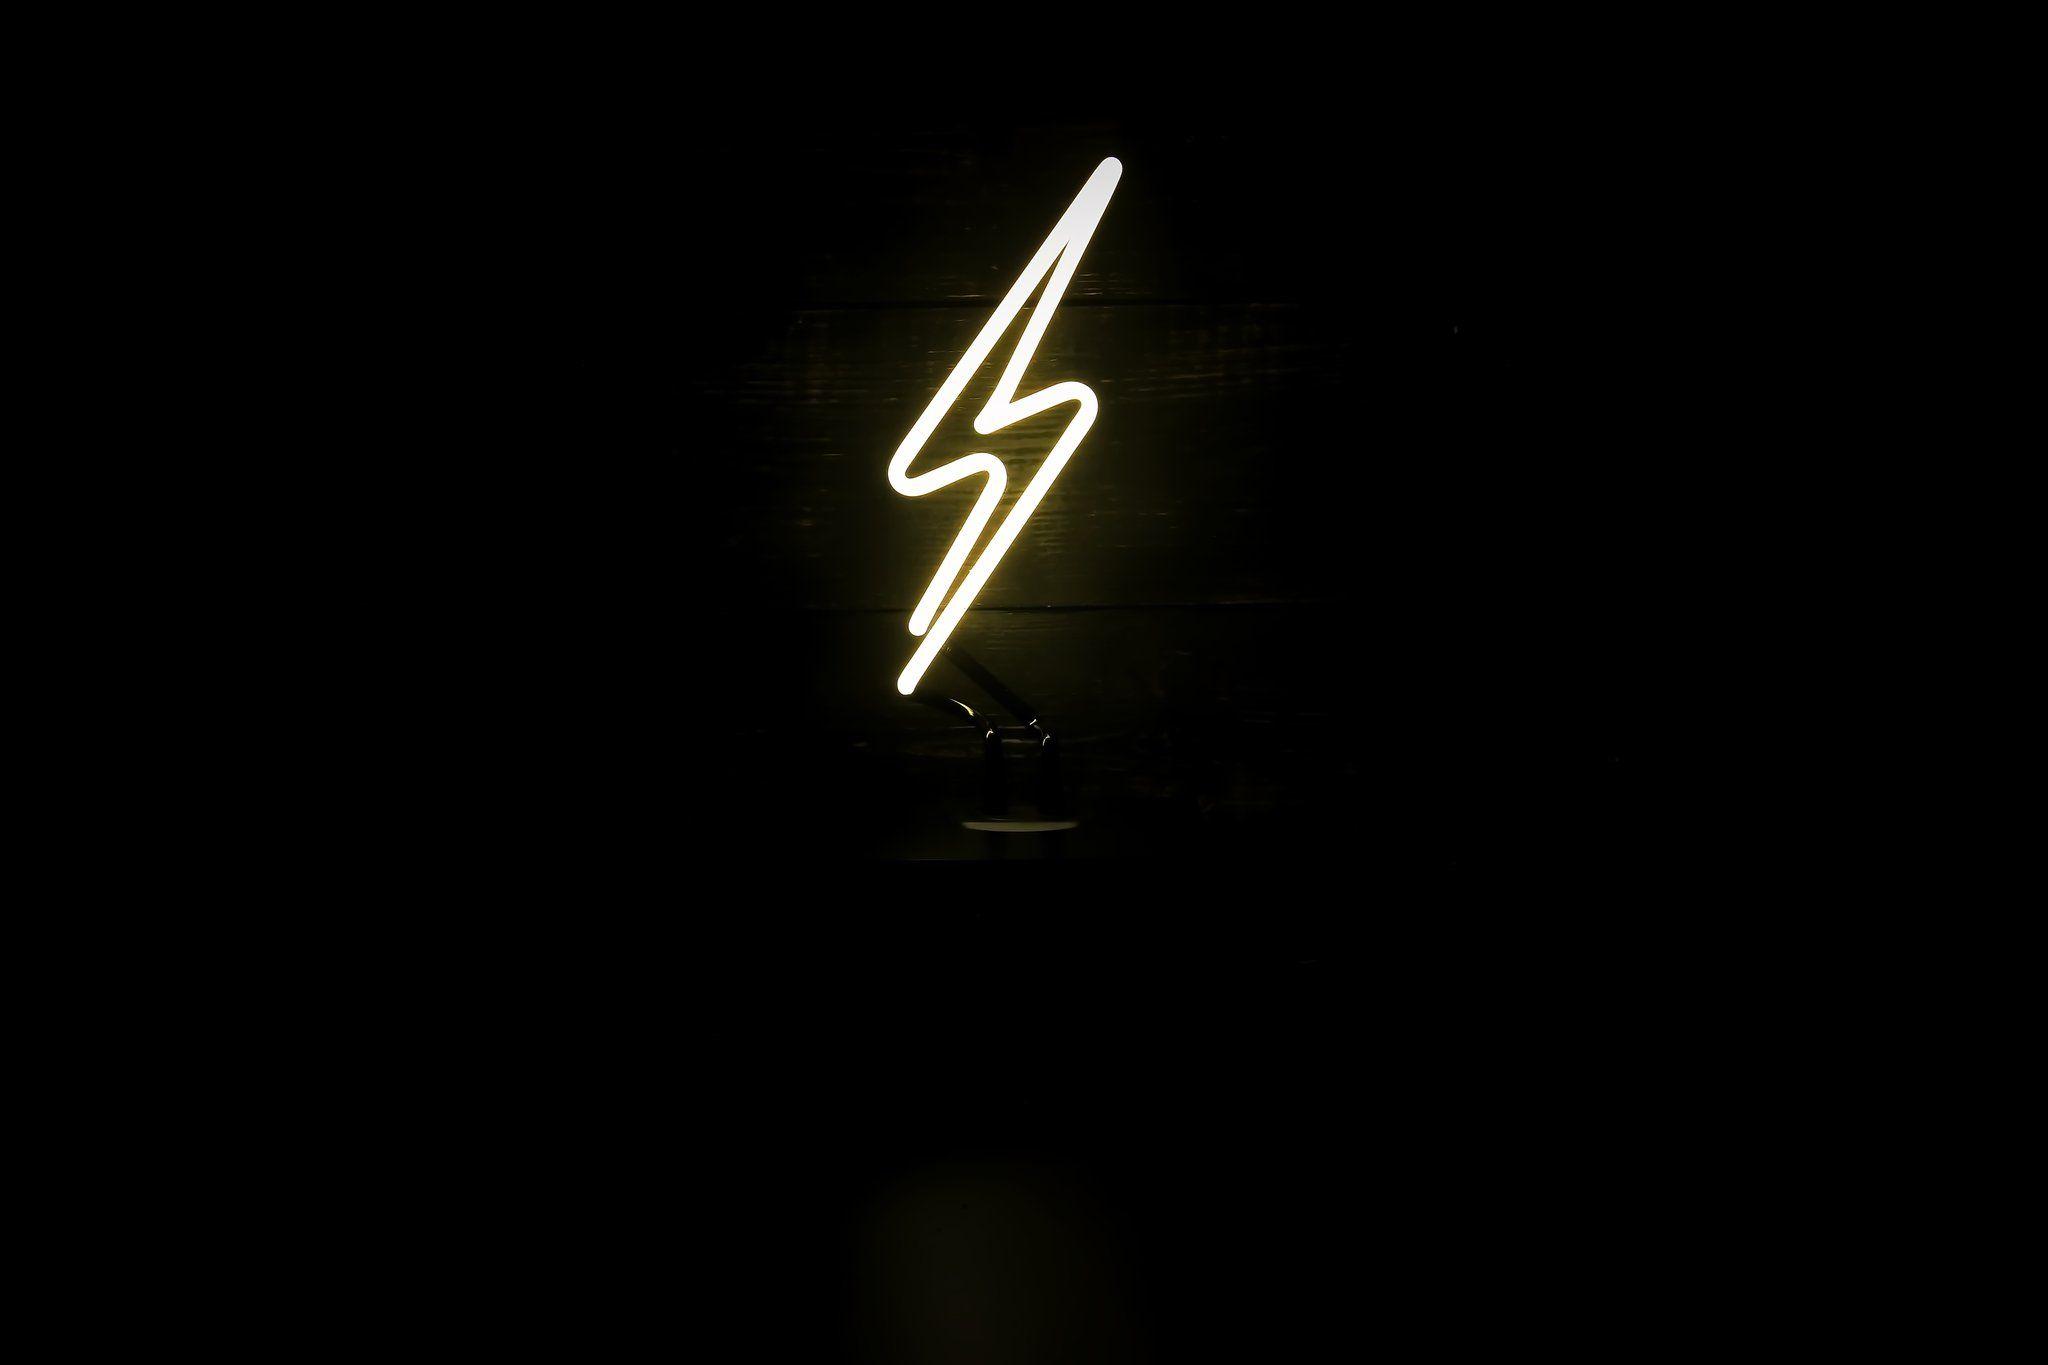 Lightning Bolt Desktop Neon By Noble Gas Industries Neon Signs Neon Words Bolt Tattoo